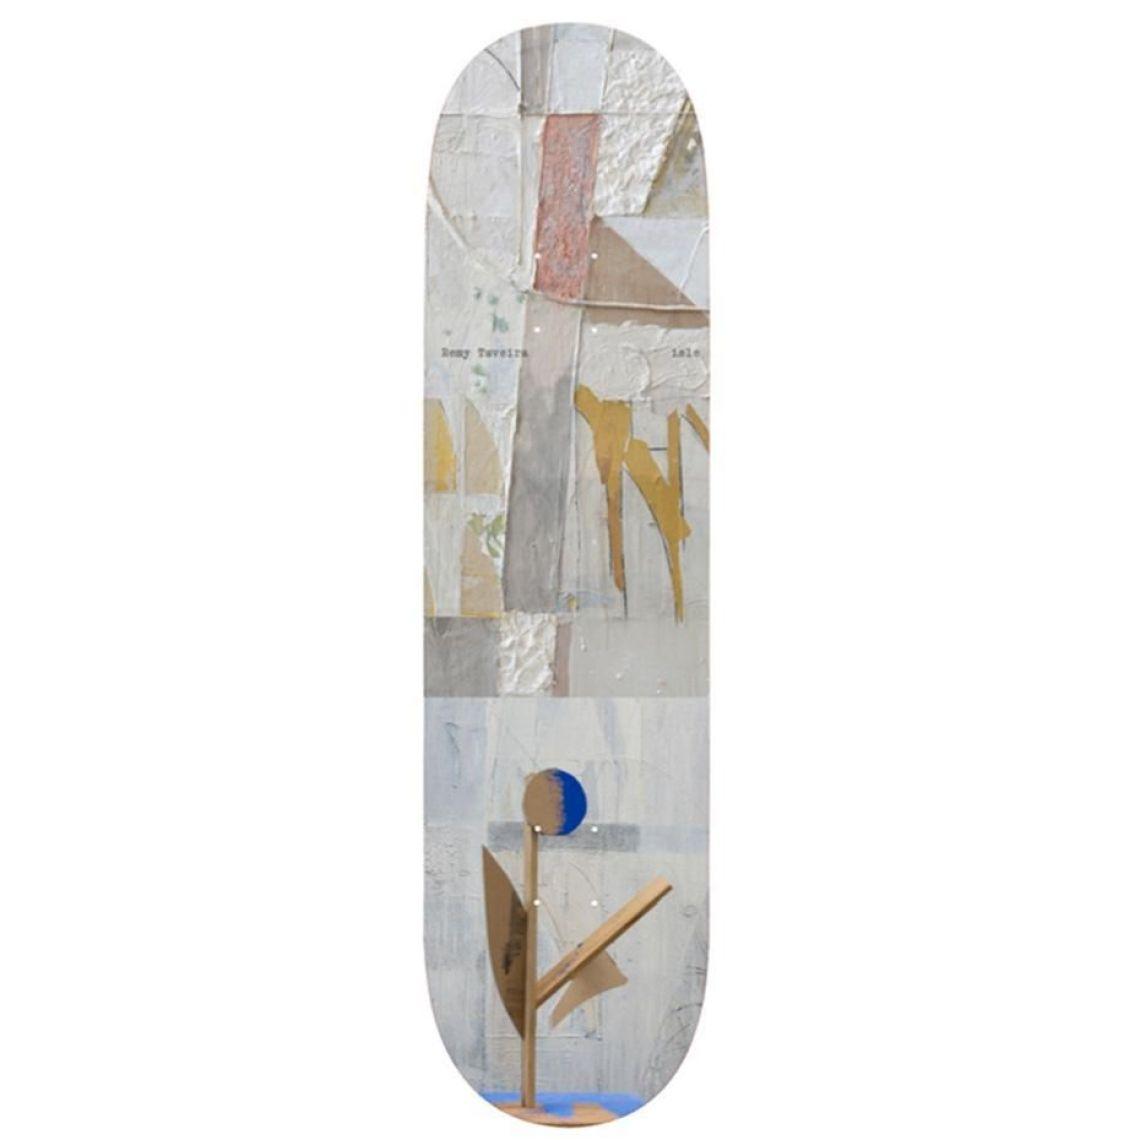 Sculpture Series By Nick Jensen X Isle Skateboards 9